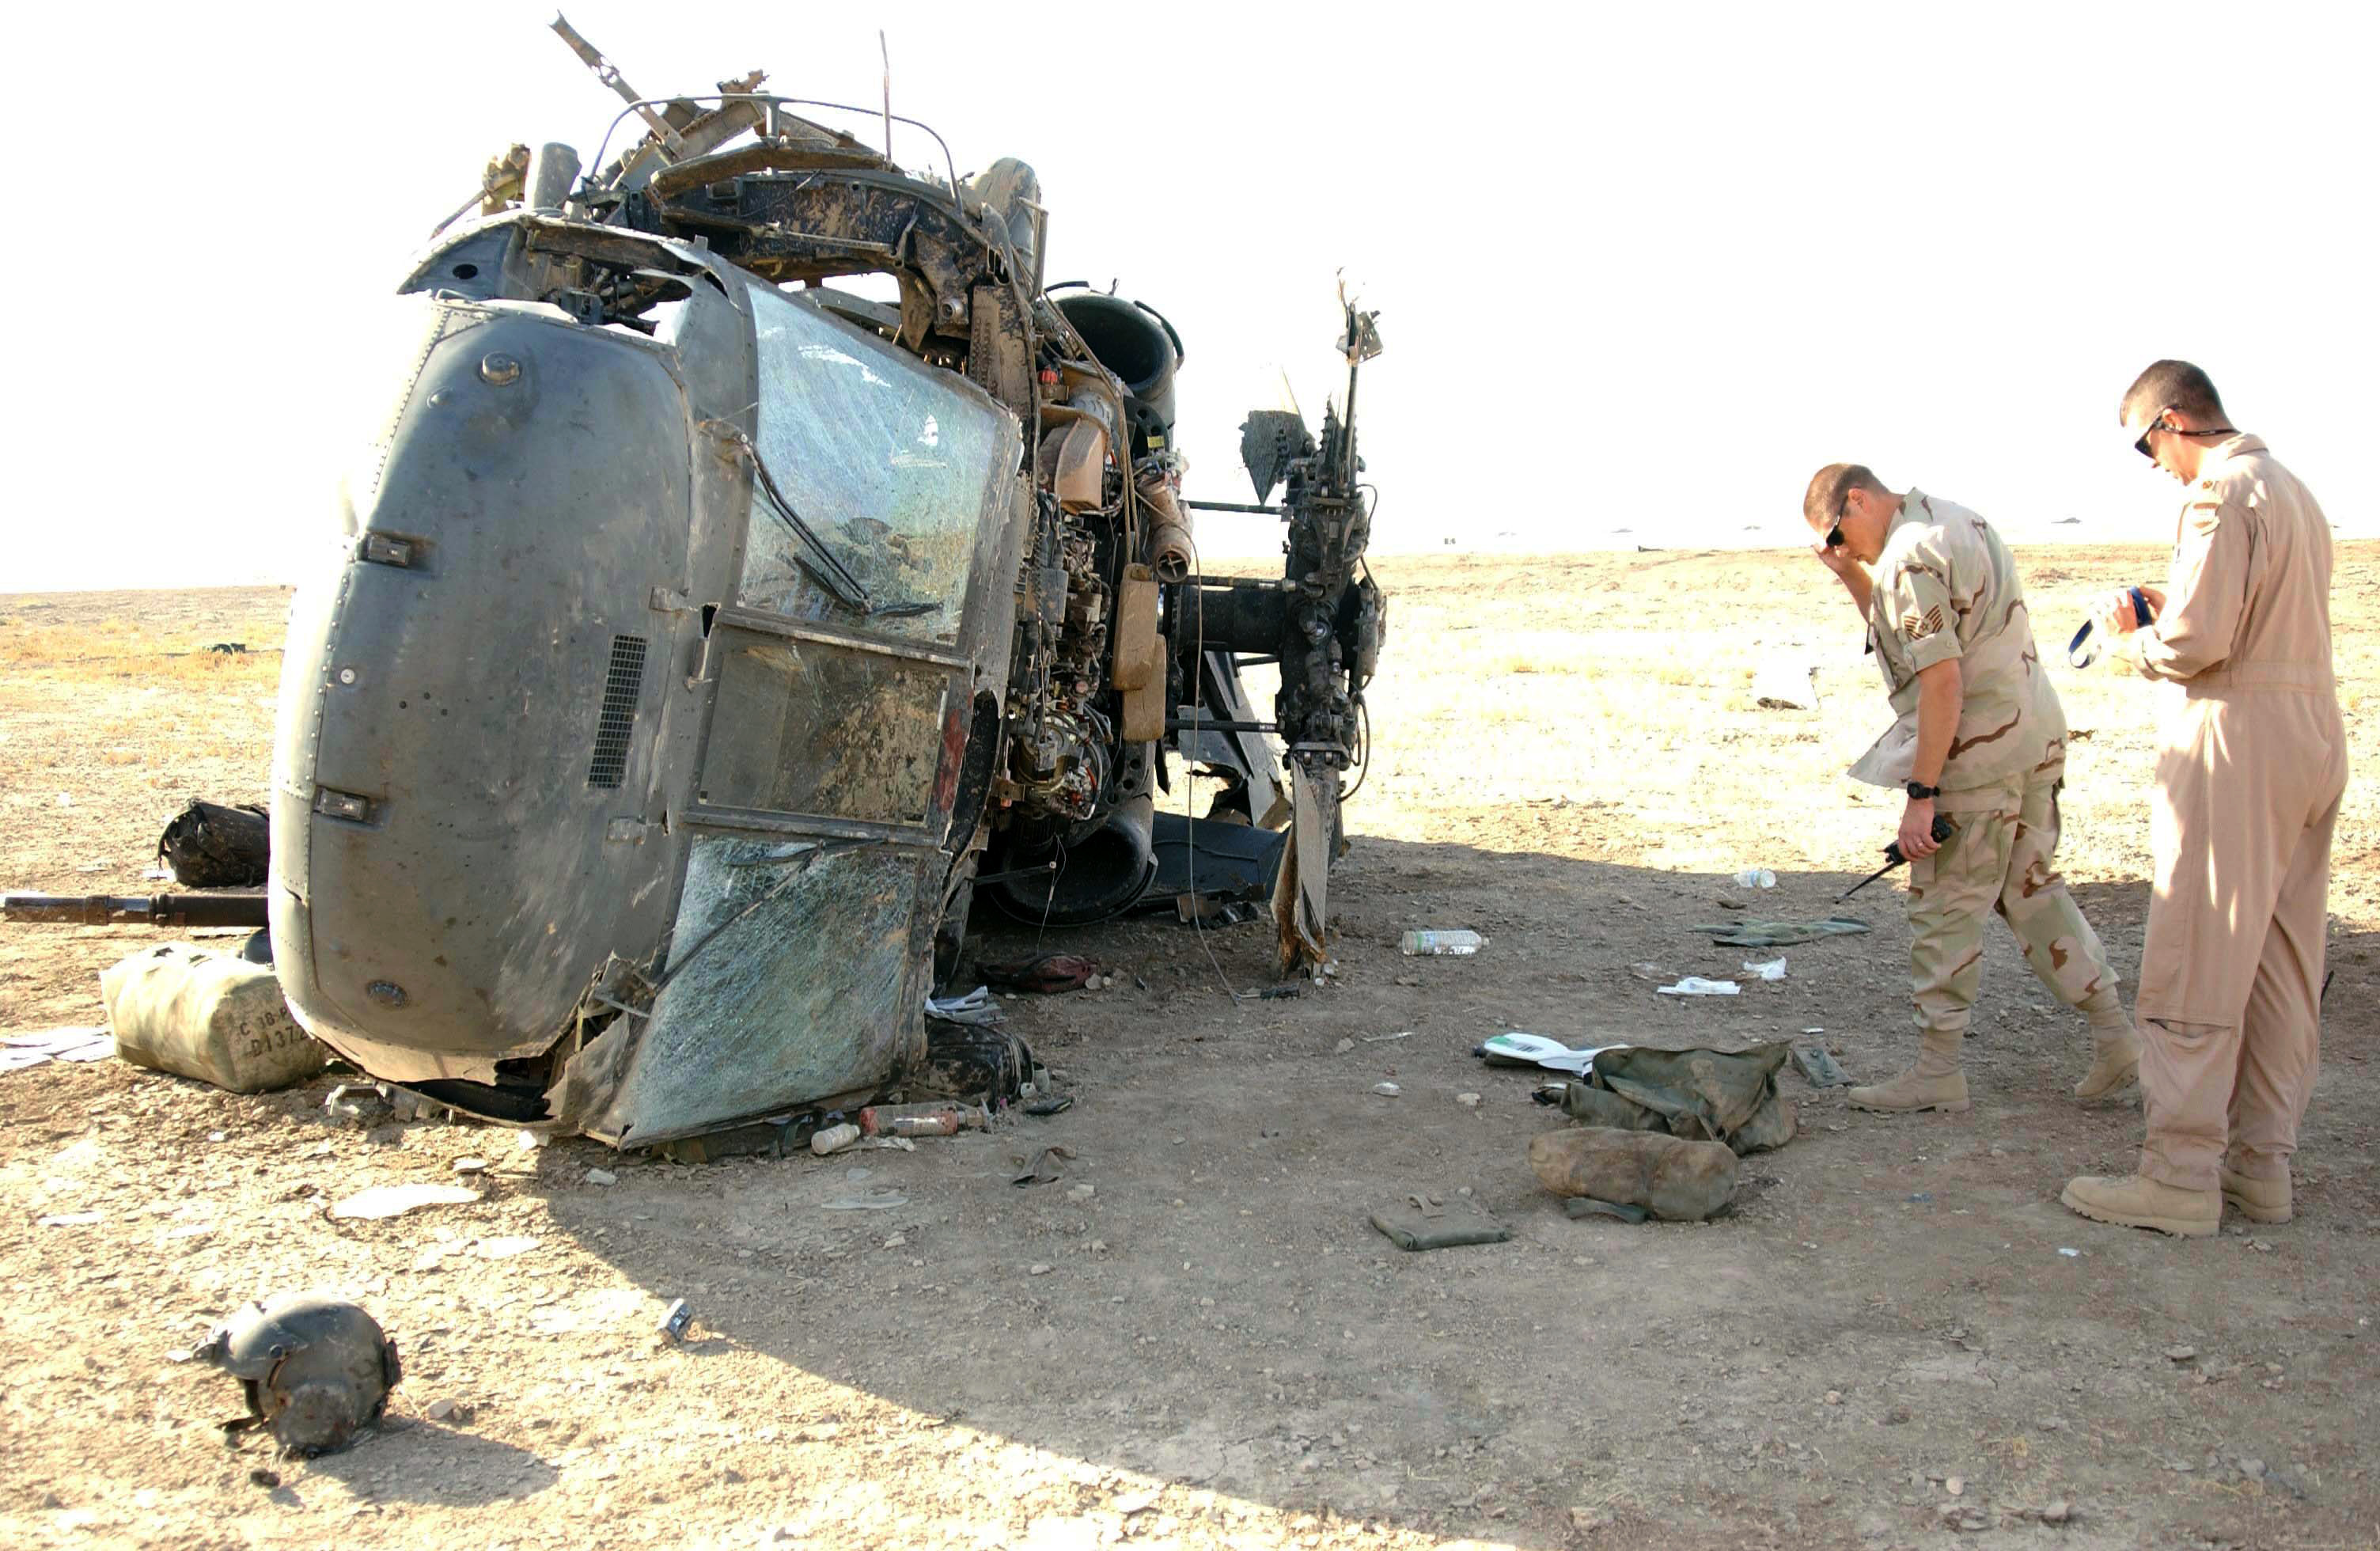 Iraq-downed_uh60.JPG